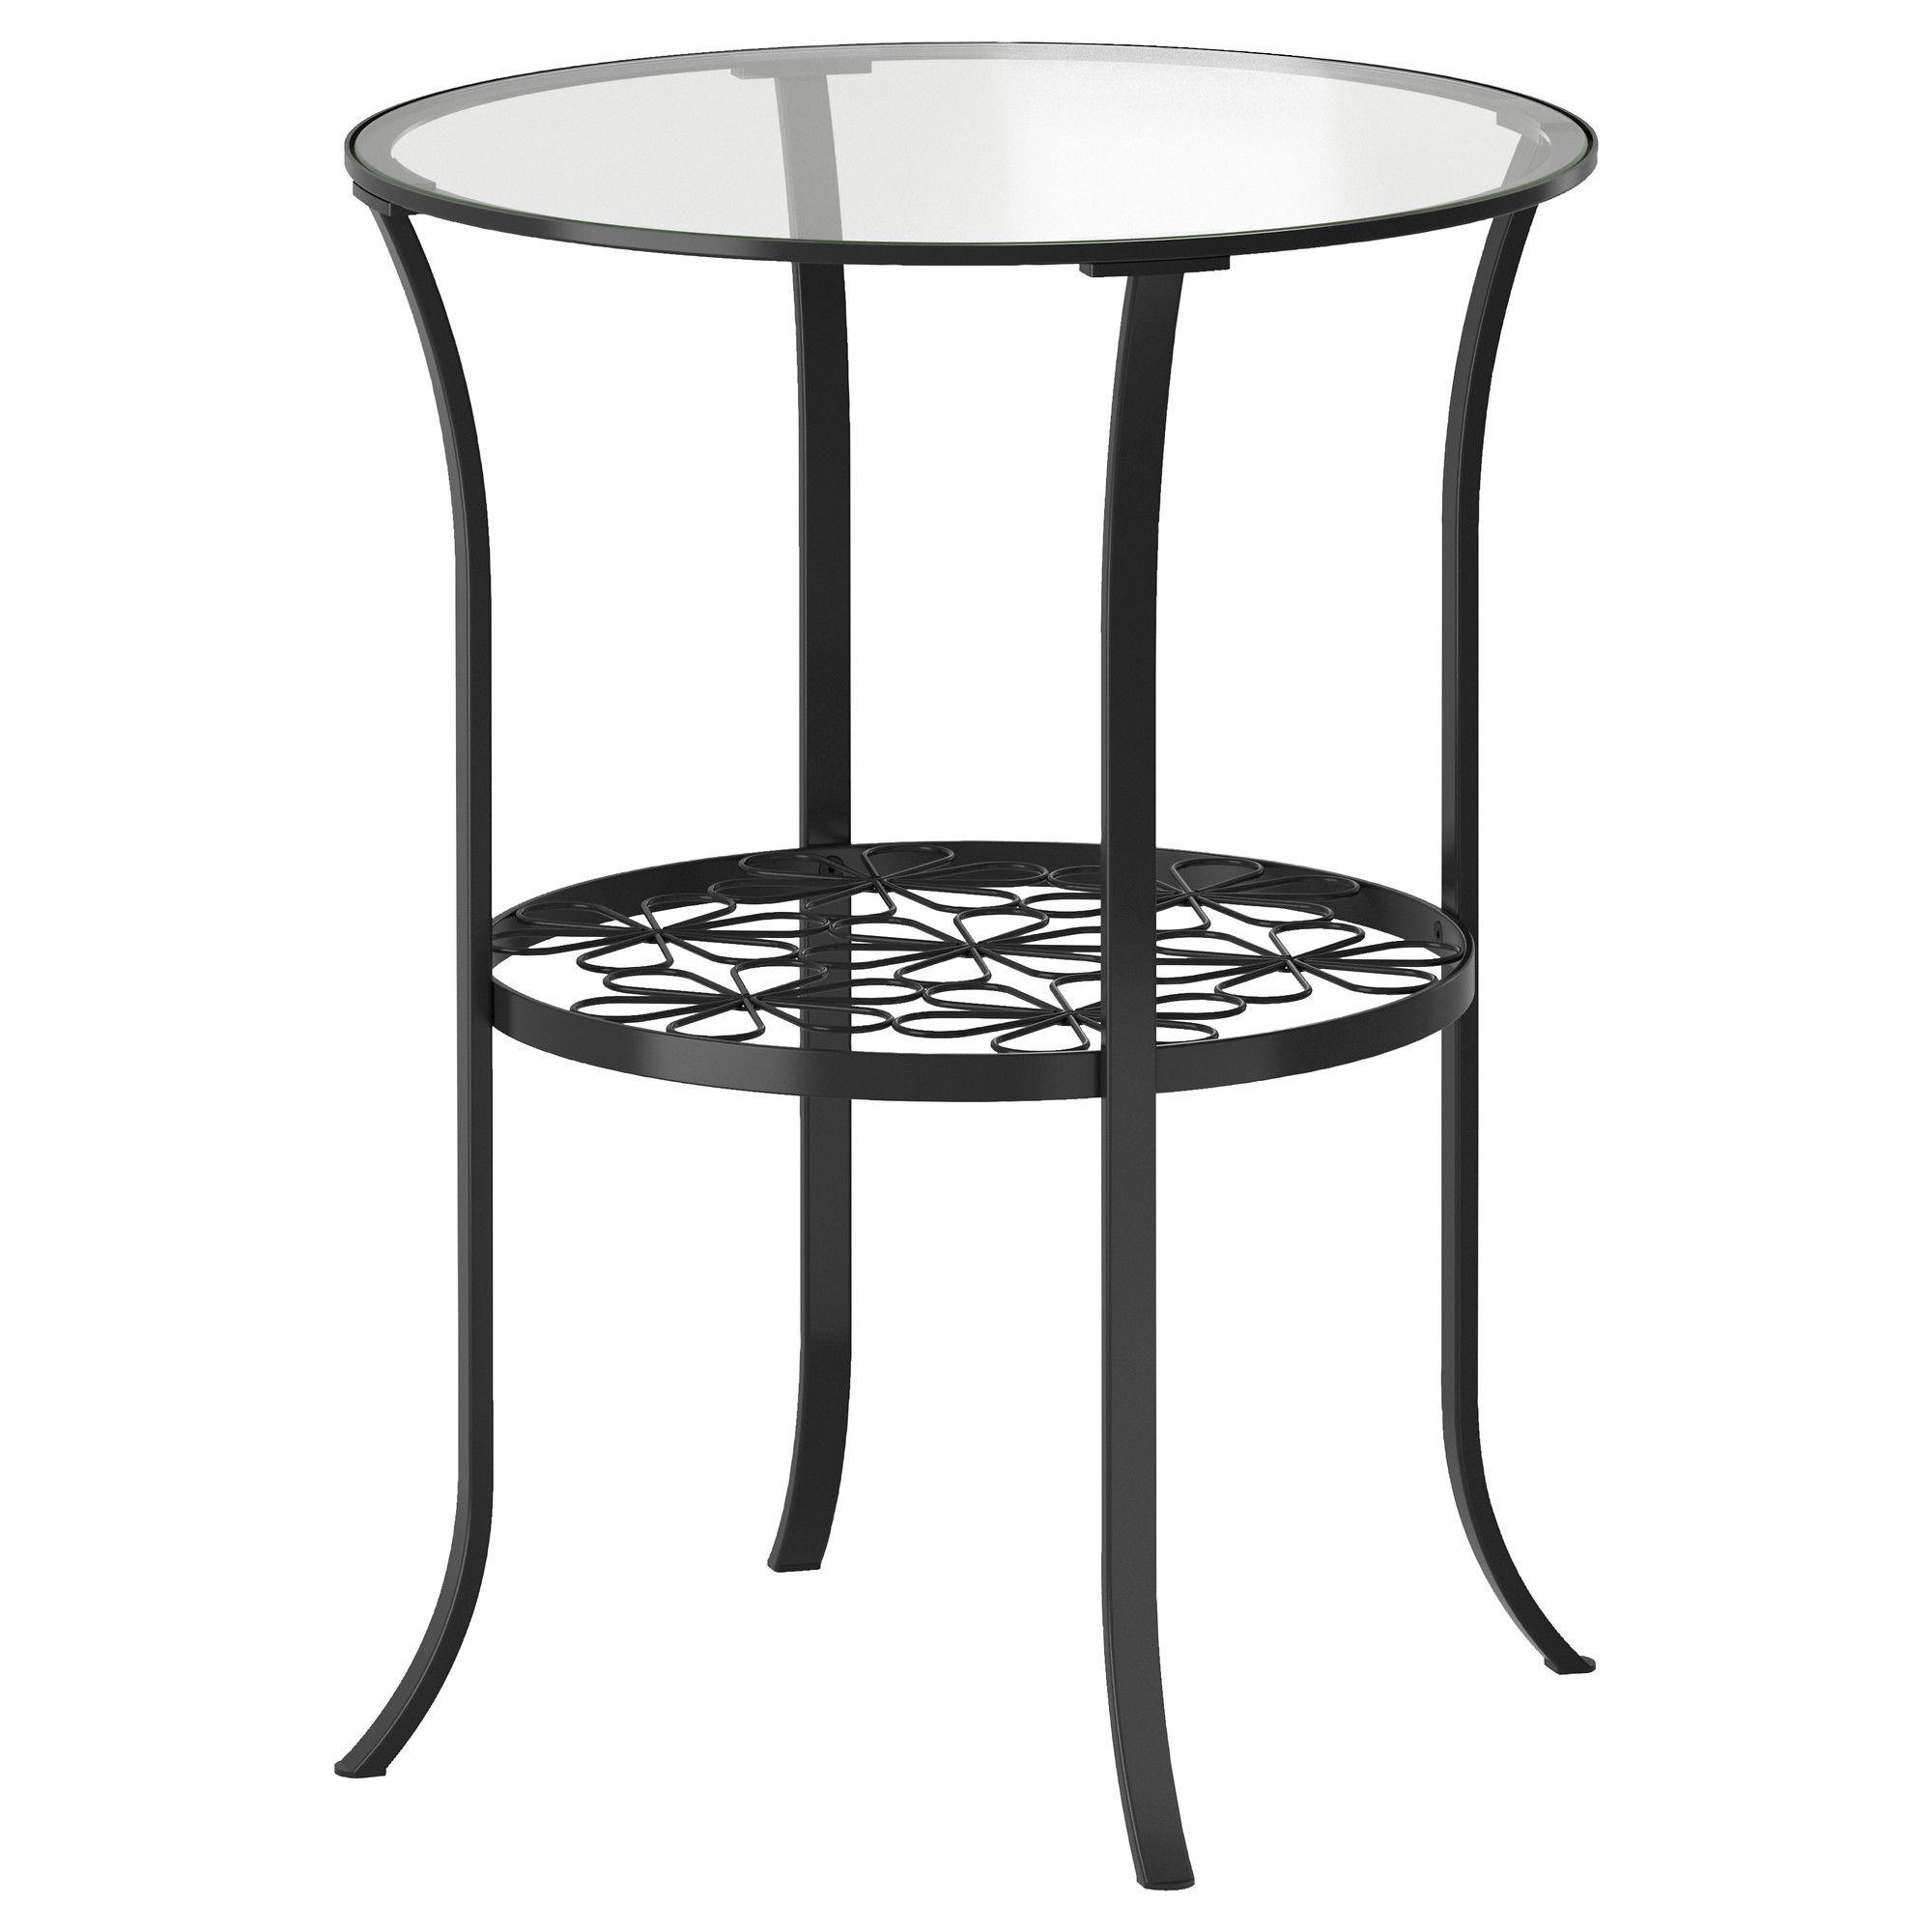 Ikea Us Furniture And Home Furnishings Ikea Coffee Table Ikea Side Table Side Table